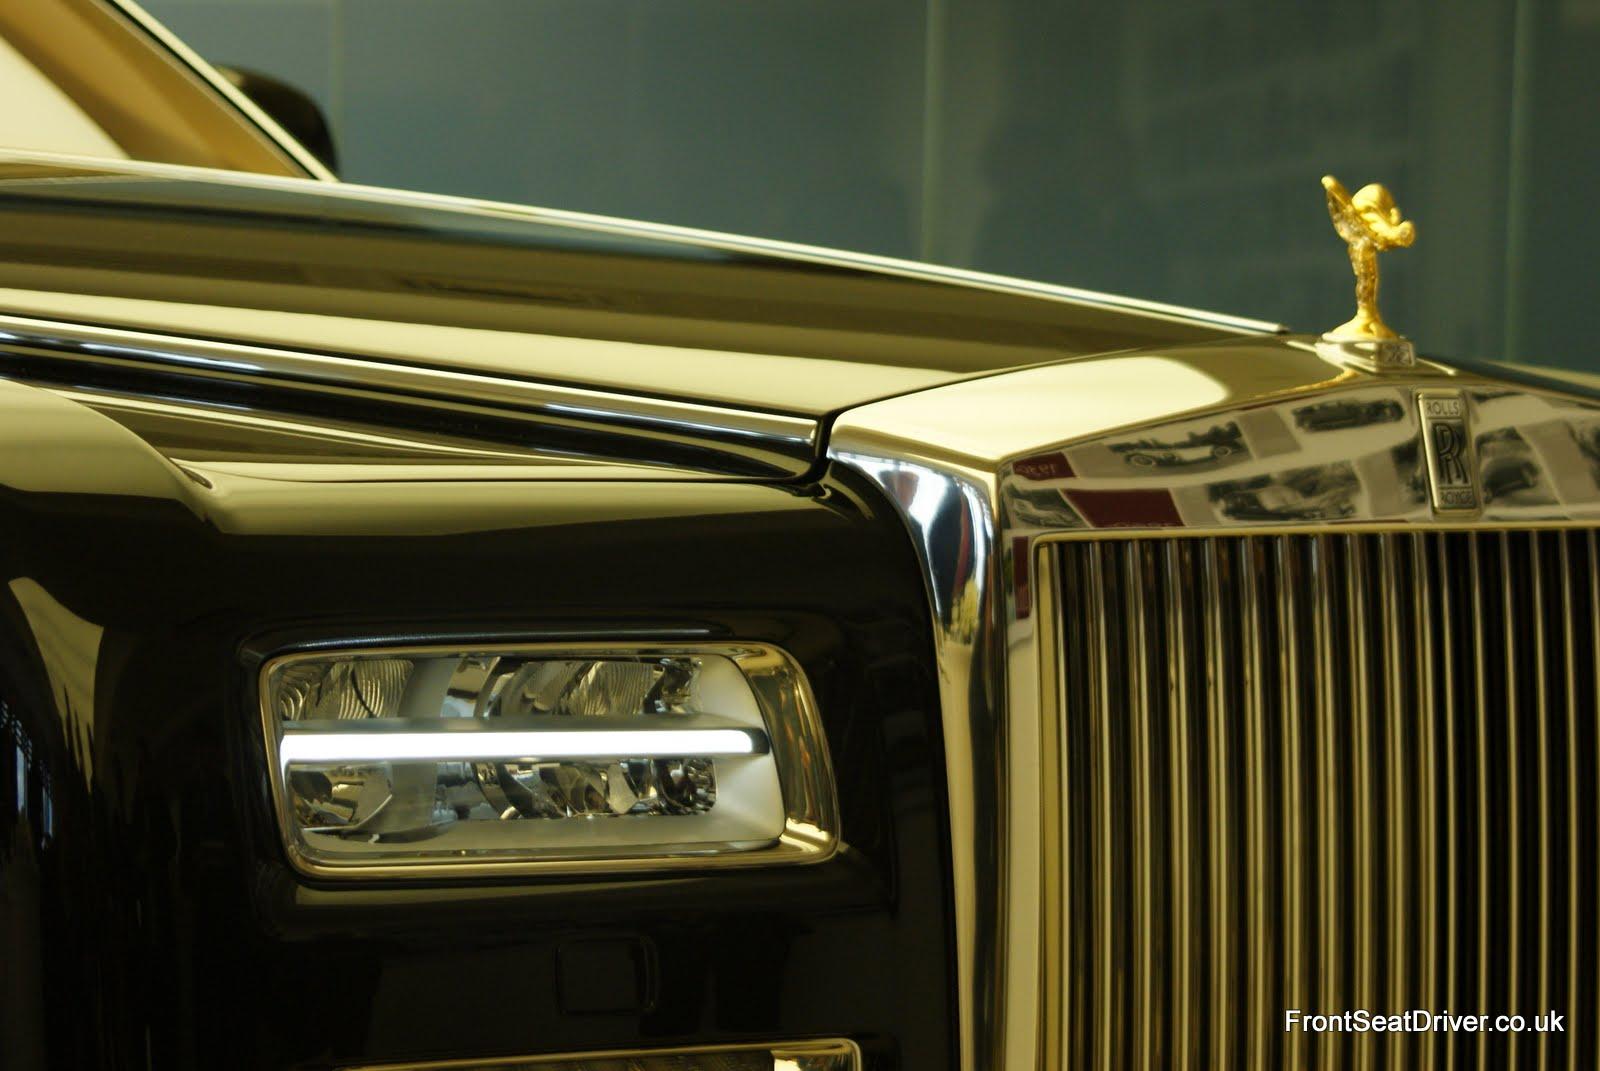 Rolls Royce Phantom Series 2 2012 Grille And Led Headlight